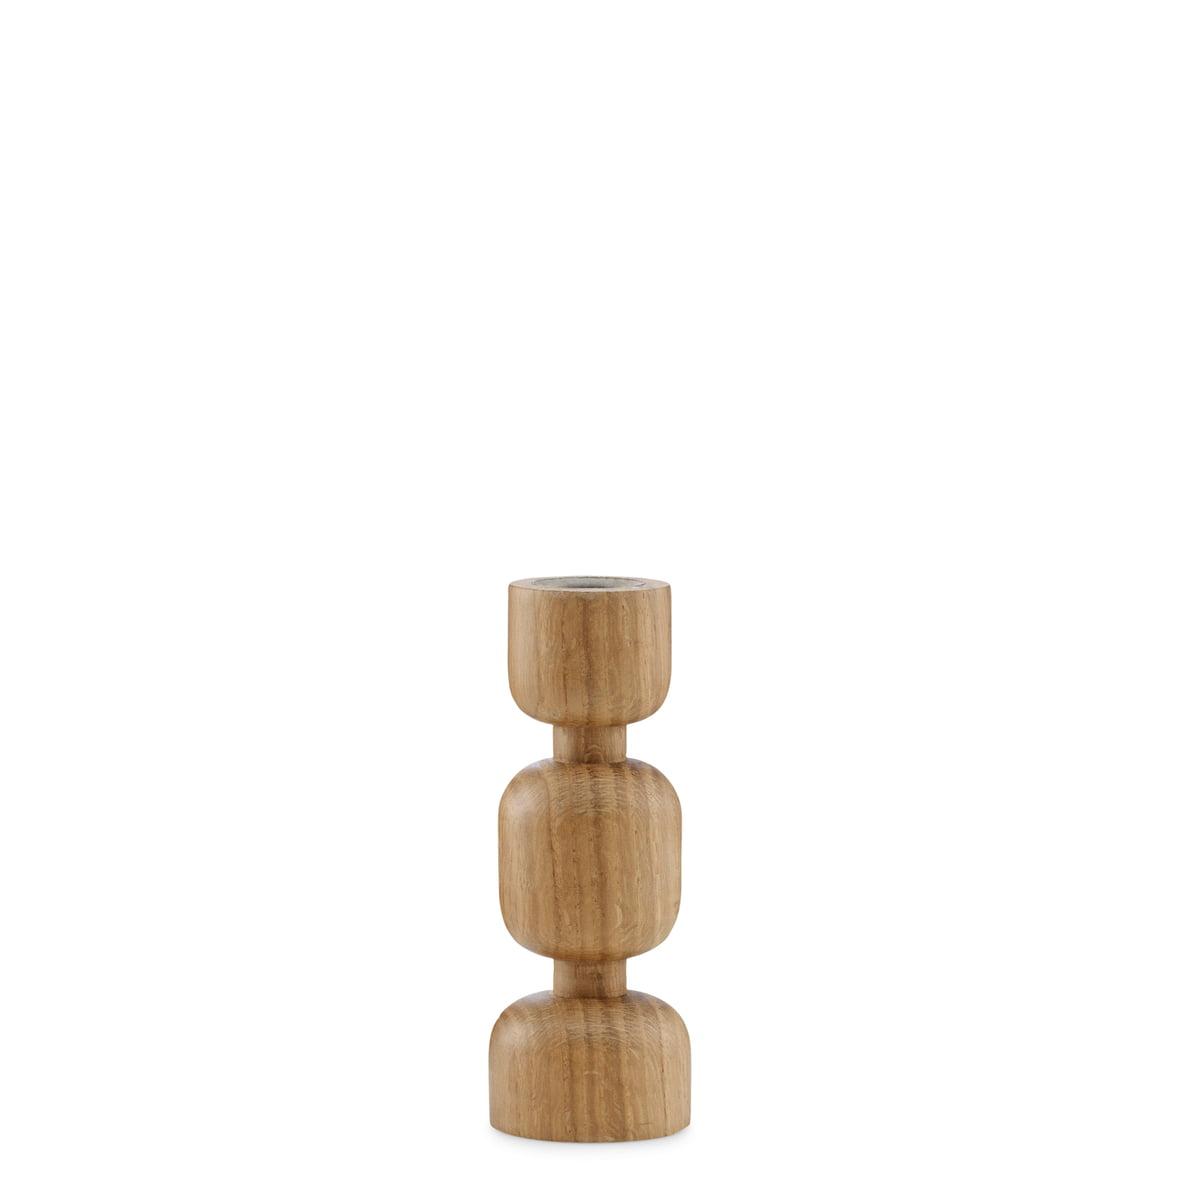 lumberjack candleholder by normann copenhagen. Black Bedroom Furniture Sets. Home Design Ideas